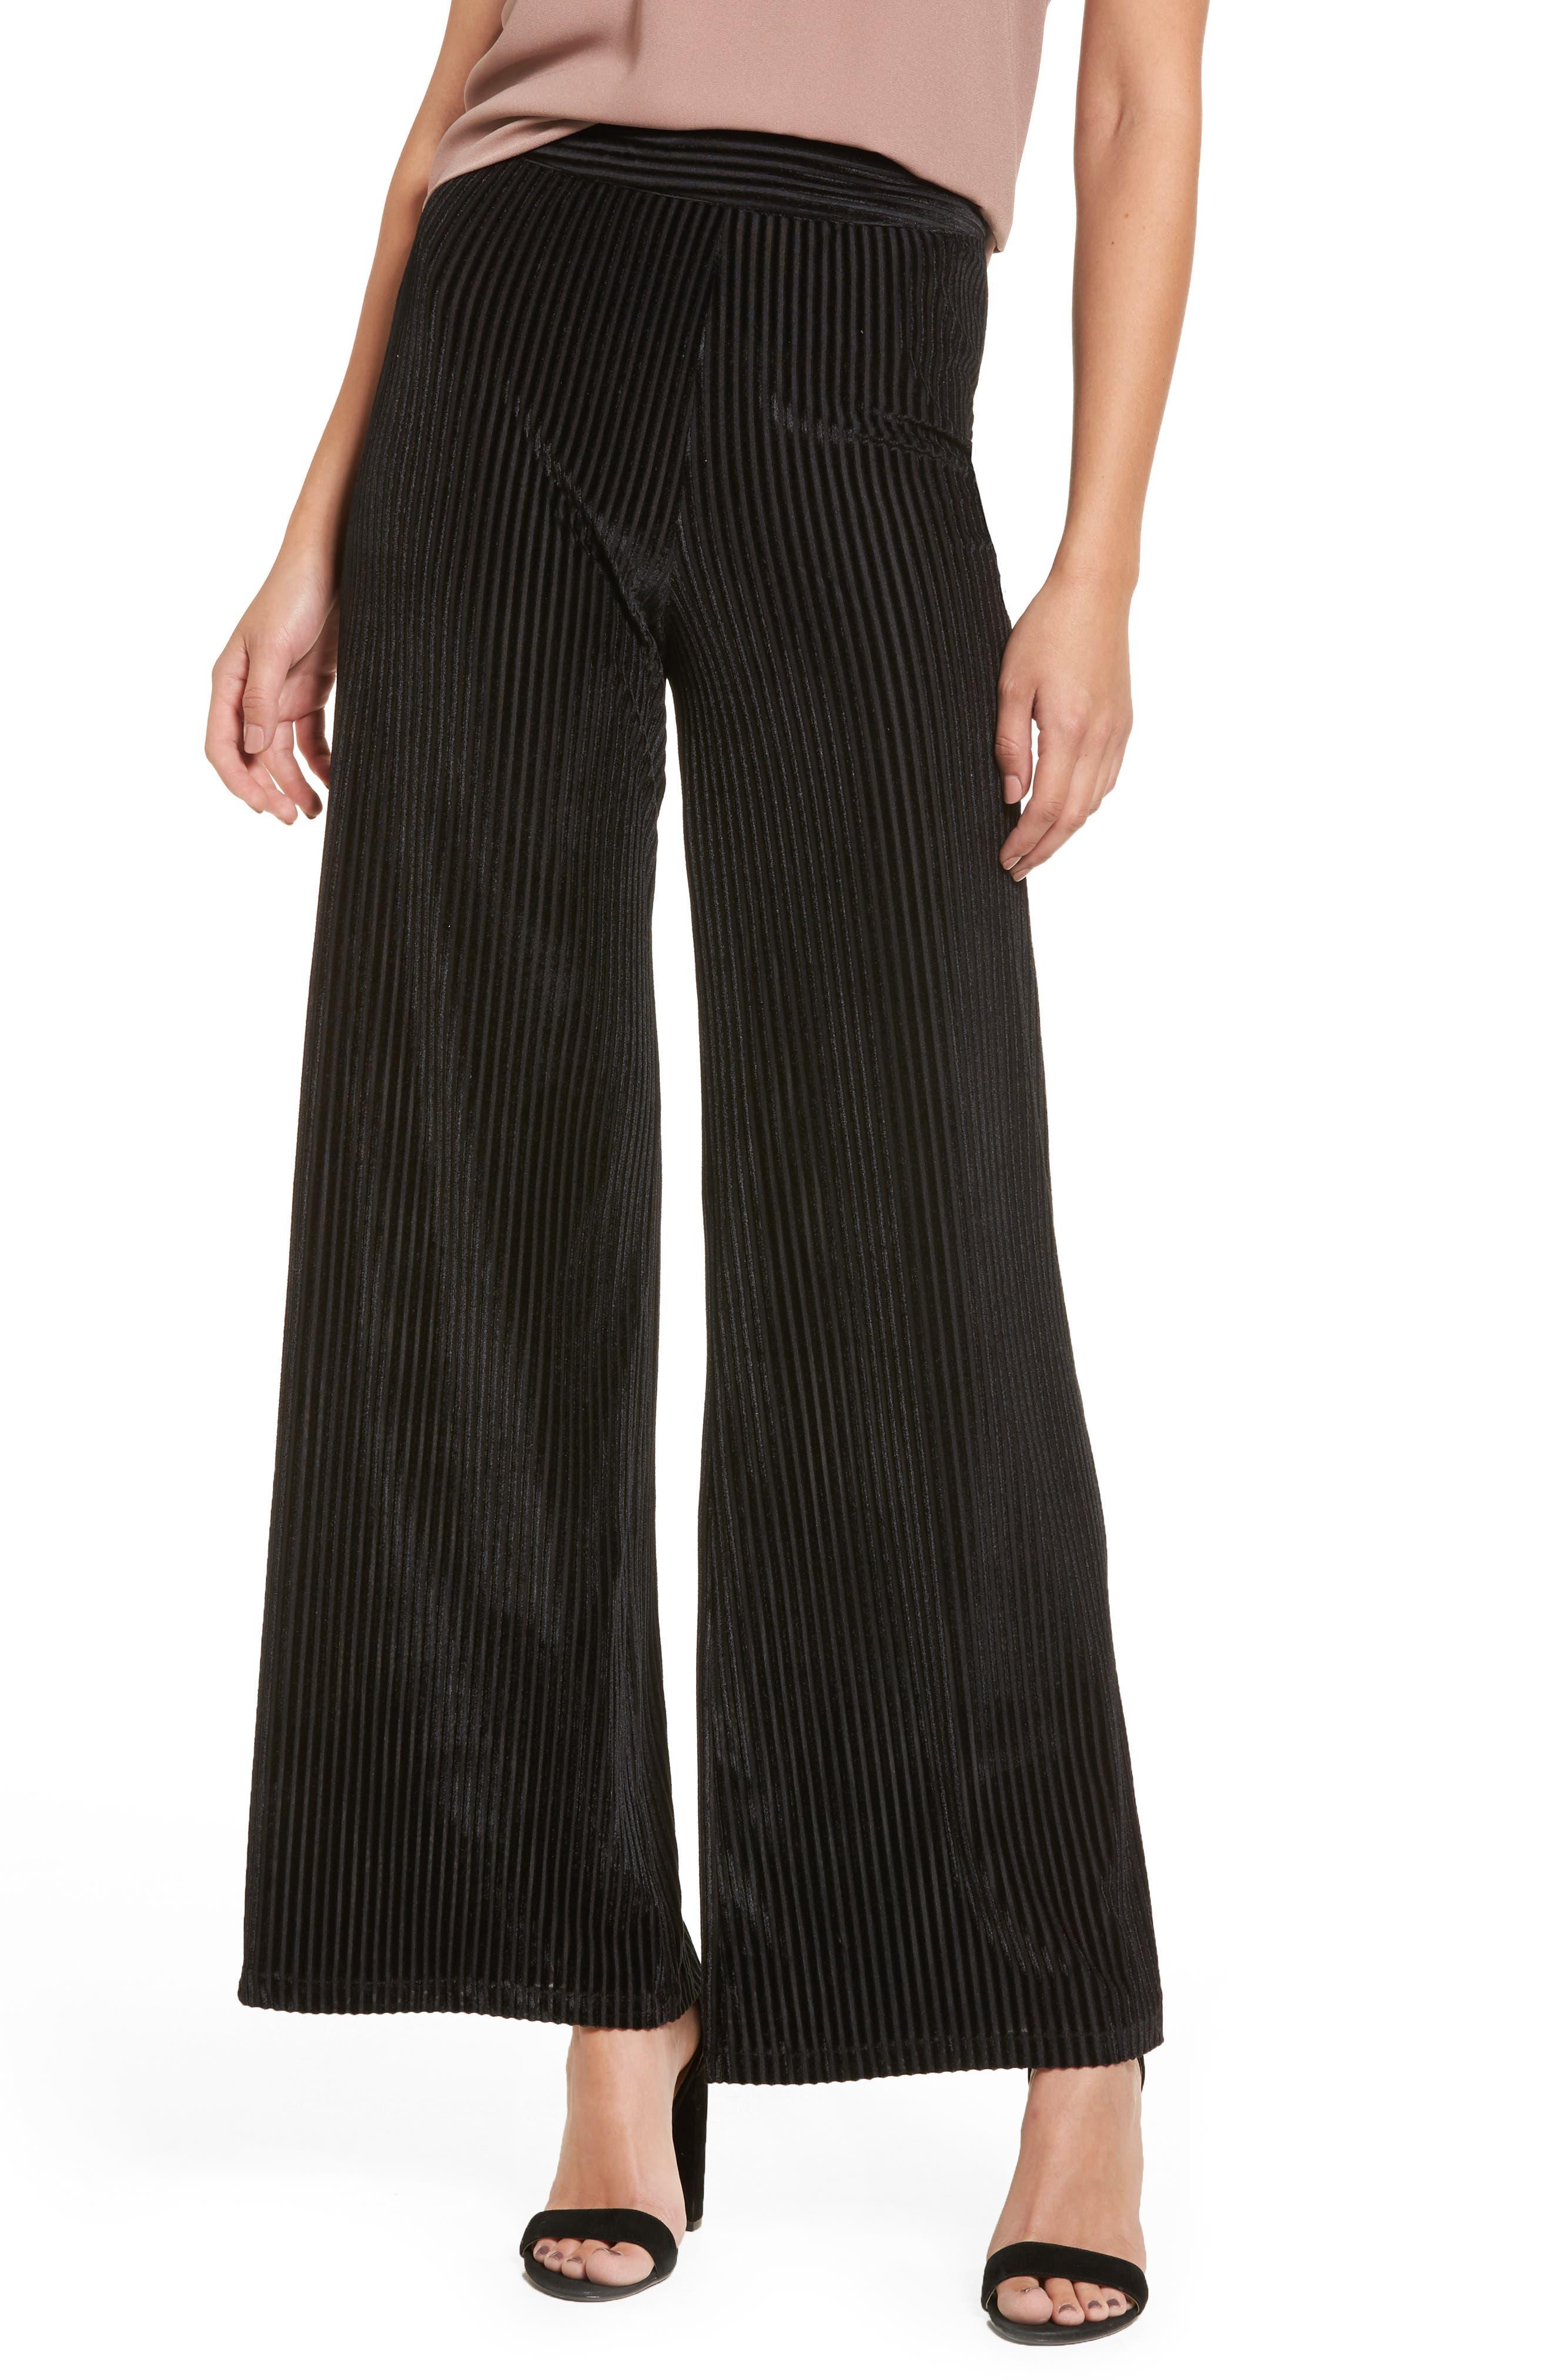 Marley Velvet Pants,                         Main,                         color, Black